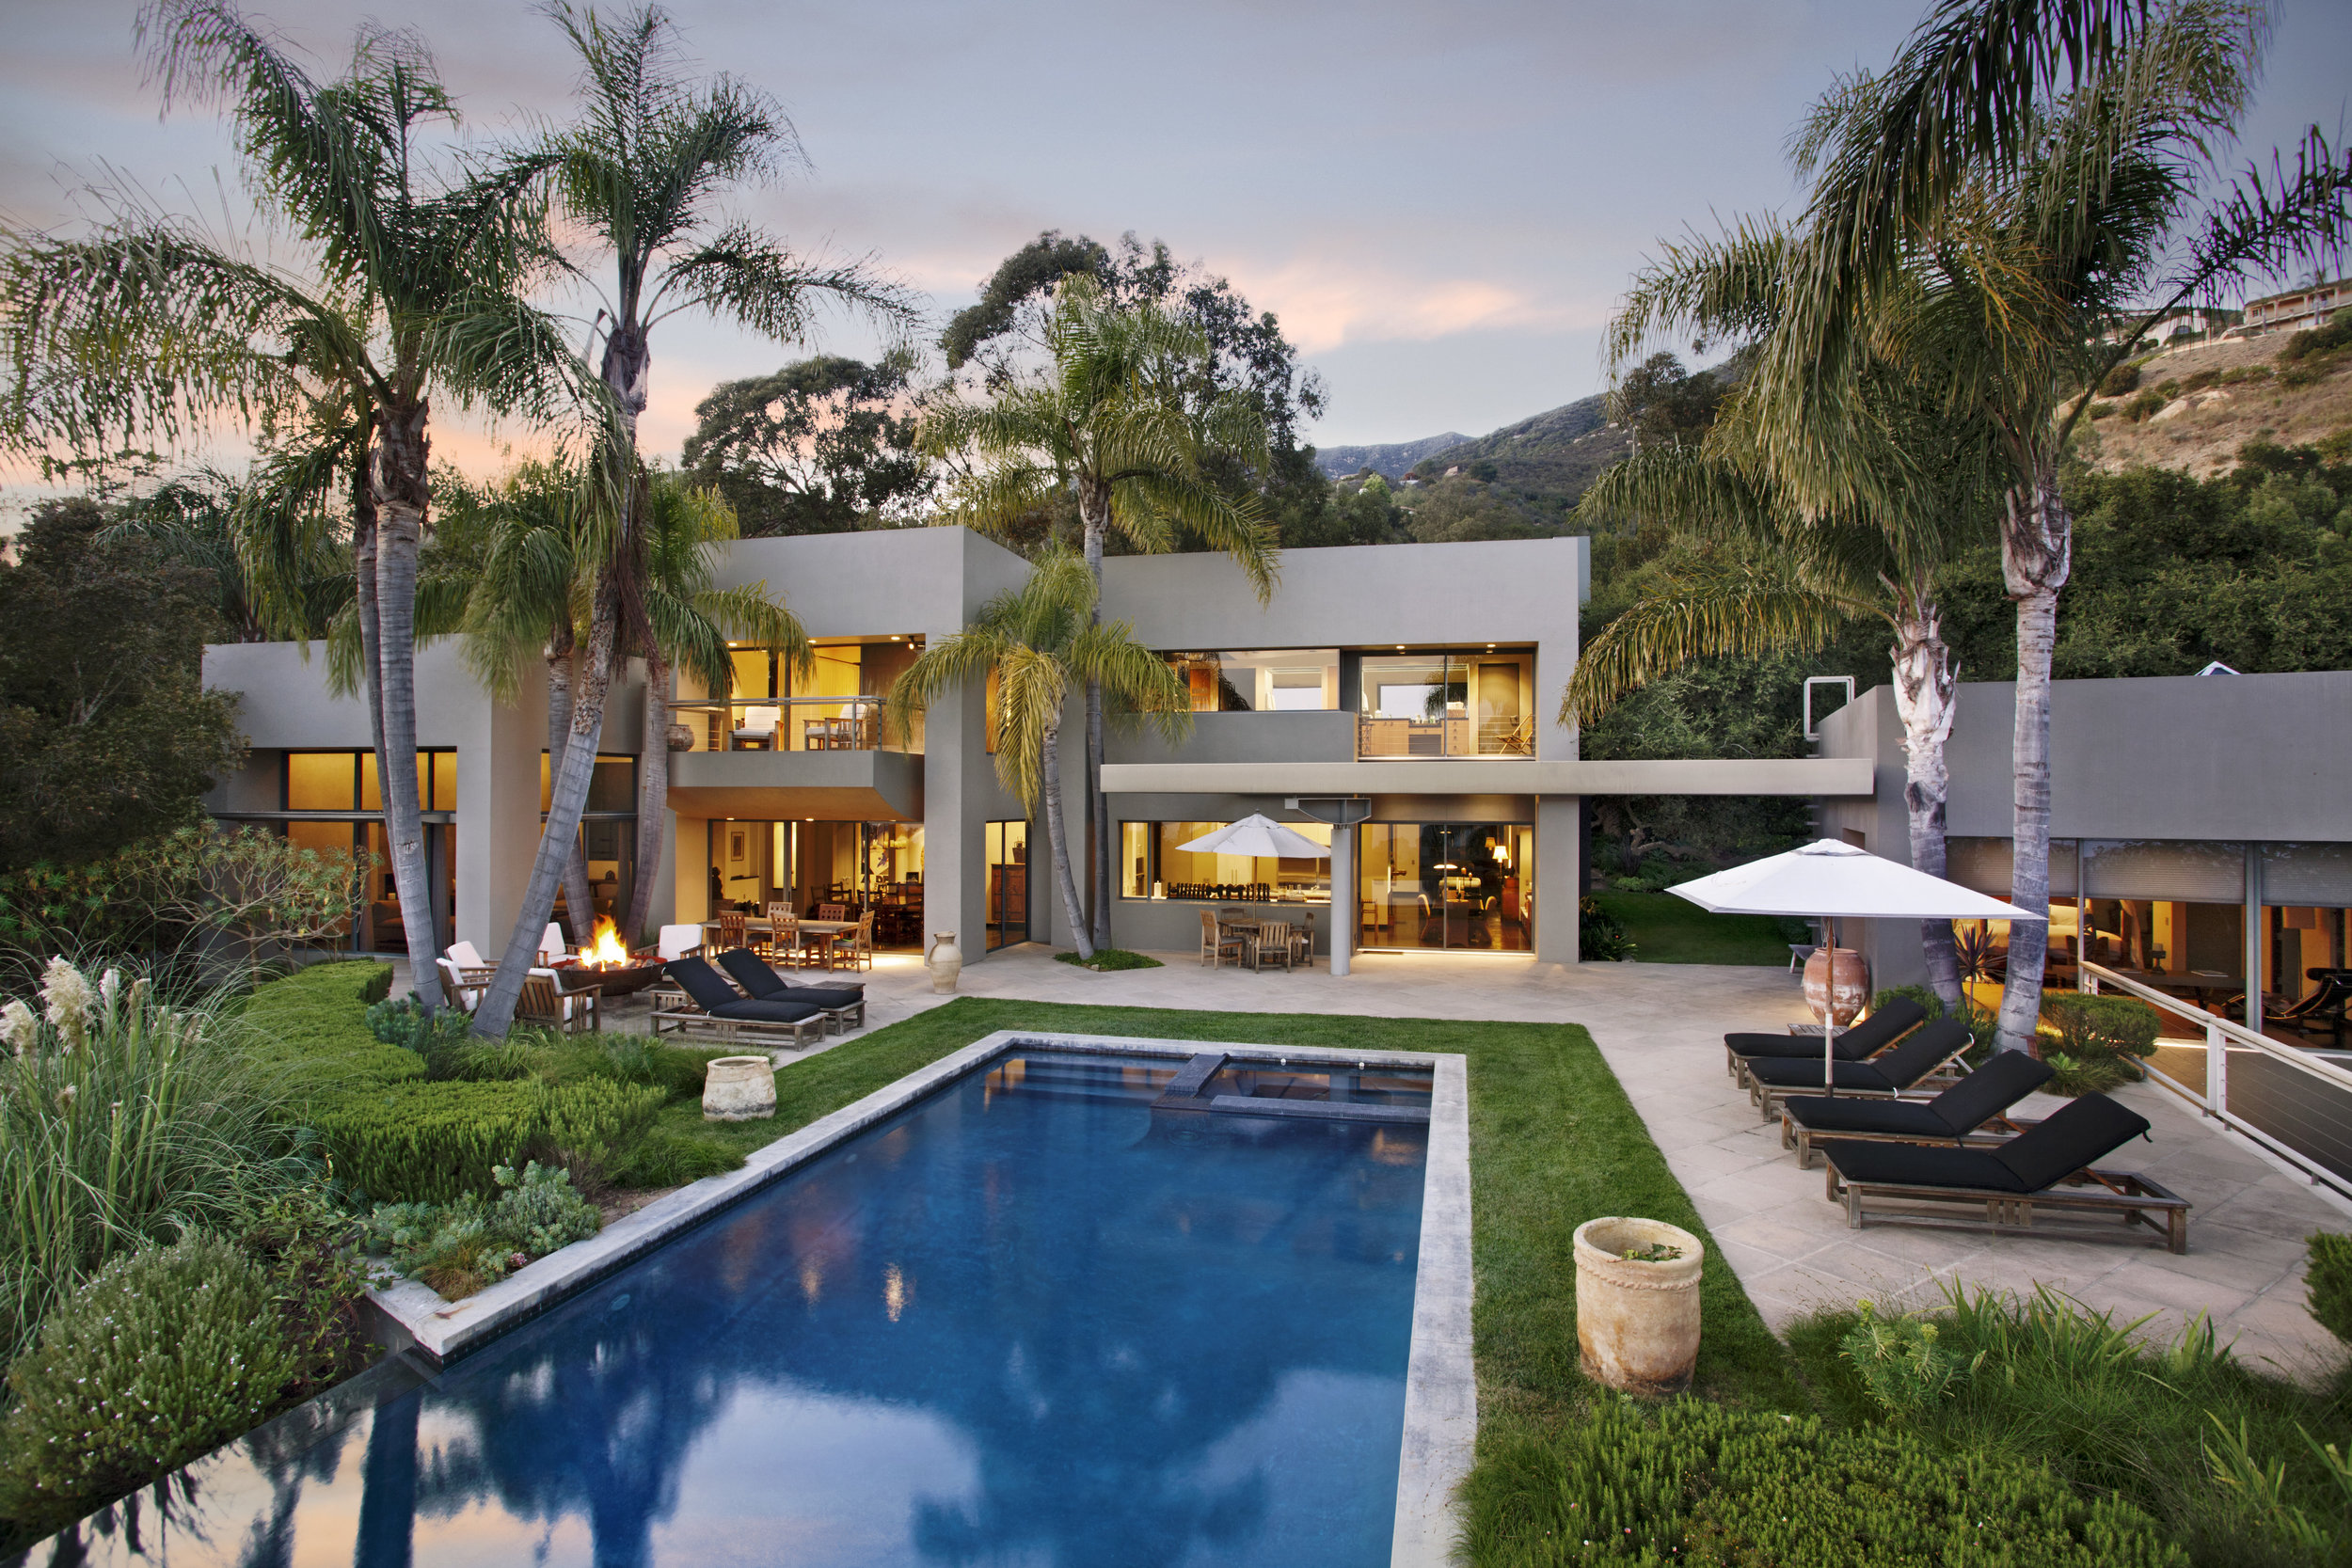 Buena Vista Residence, Montecito, CA